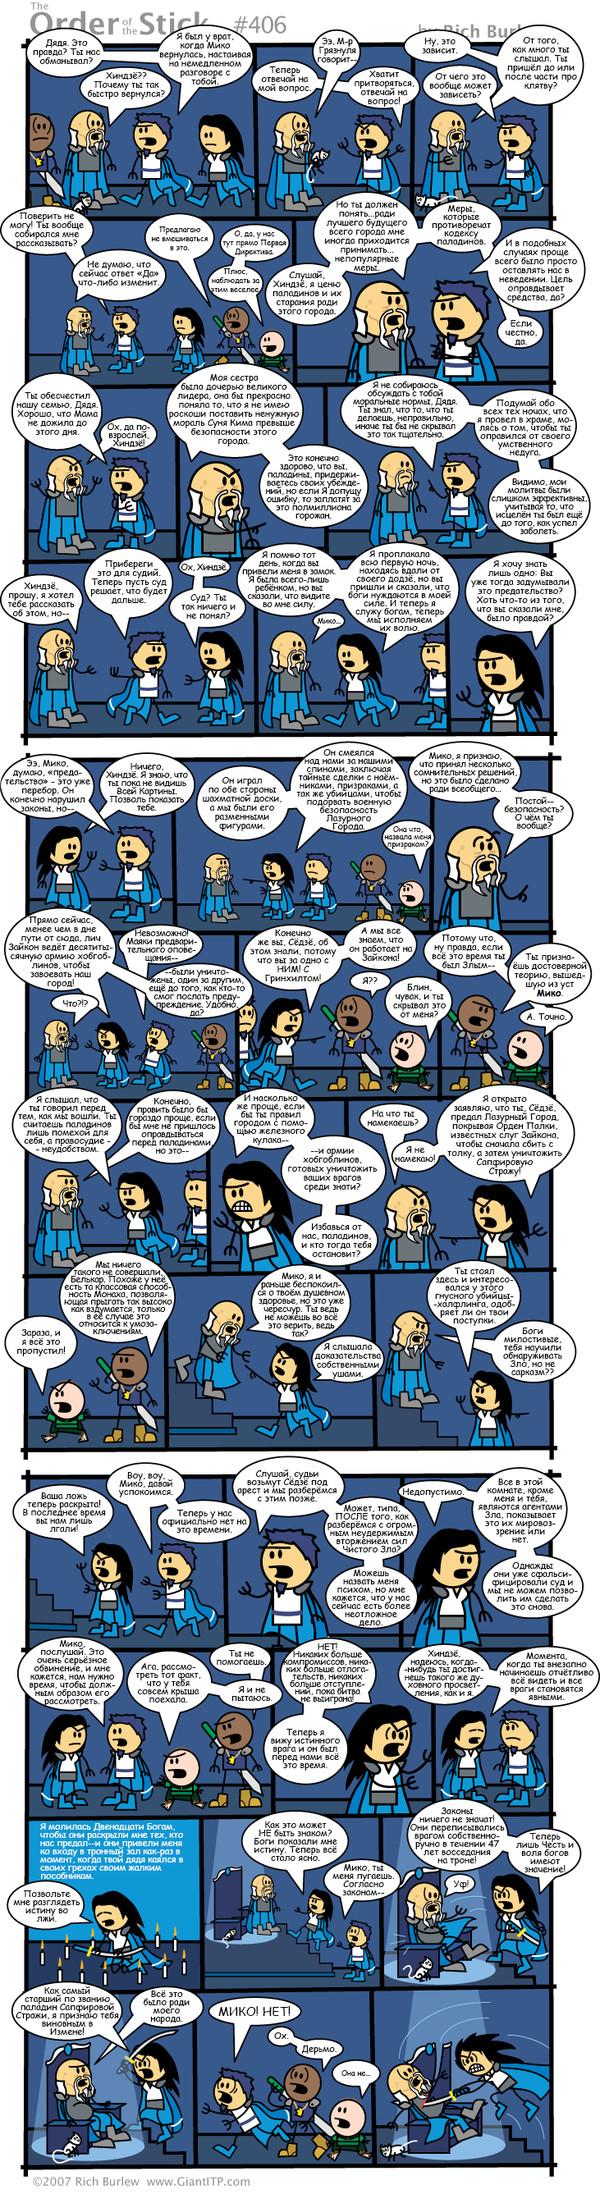 Орден Палки #143 Order of the stick, Комиксы, Dungeons & Dragons, Перевод, Длиннопост